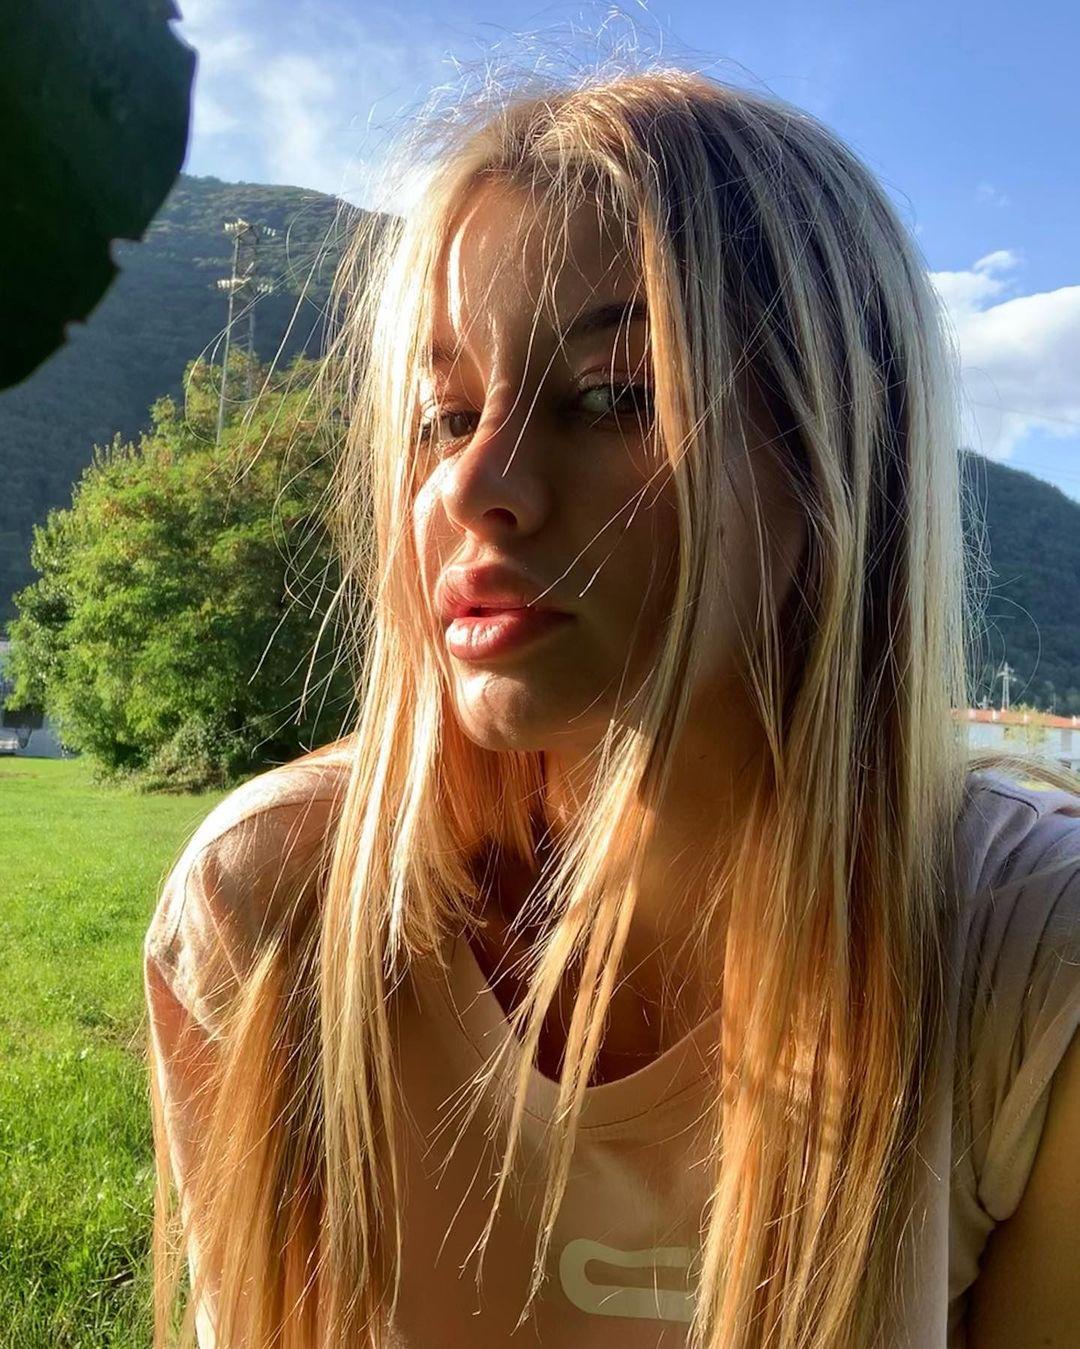 Elena-Berlato-Wallpapers-Insta-Fit-Bio-9